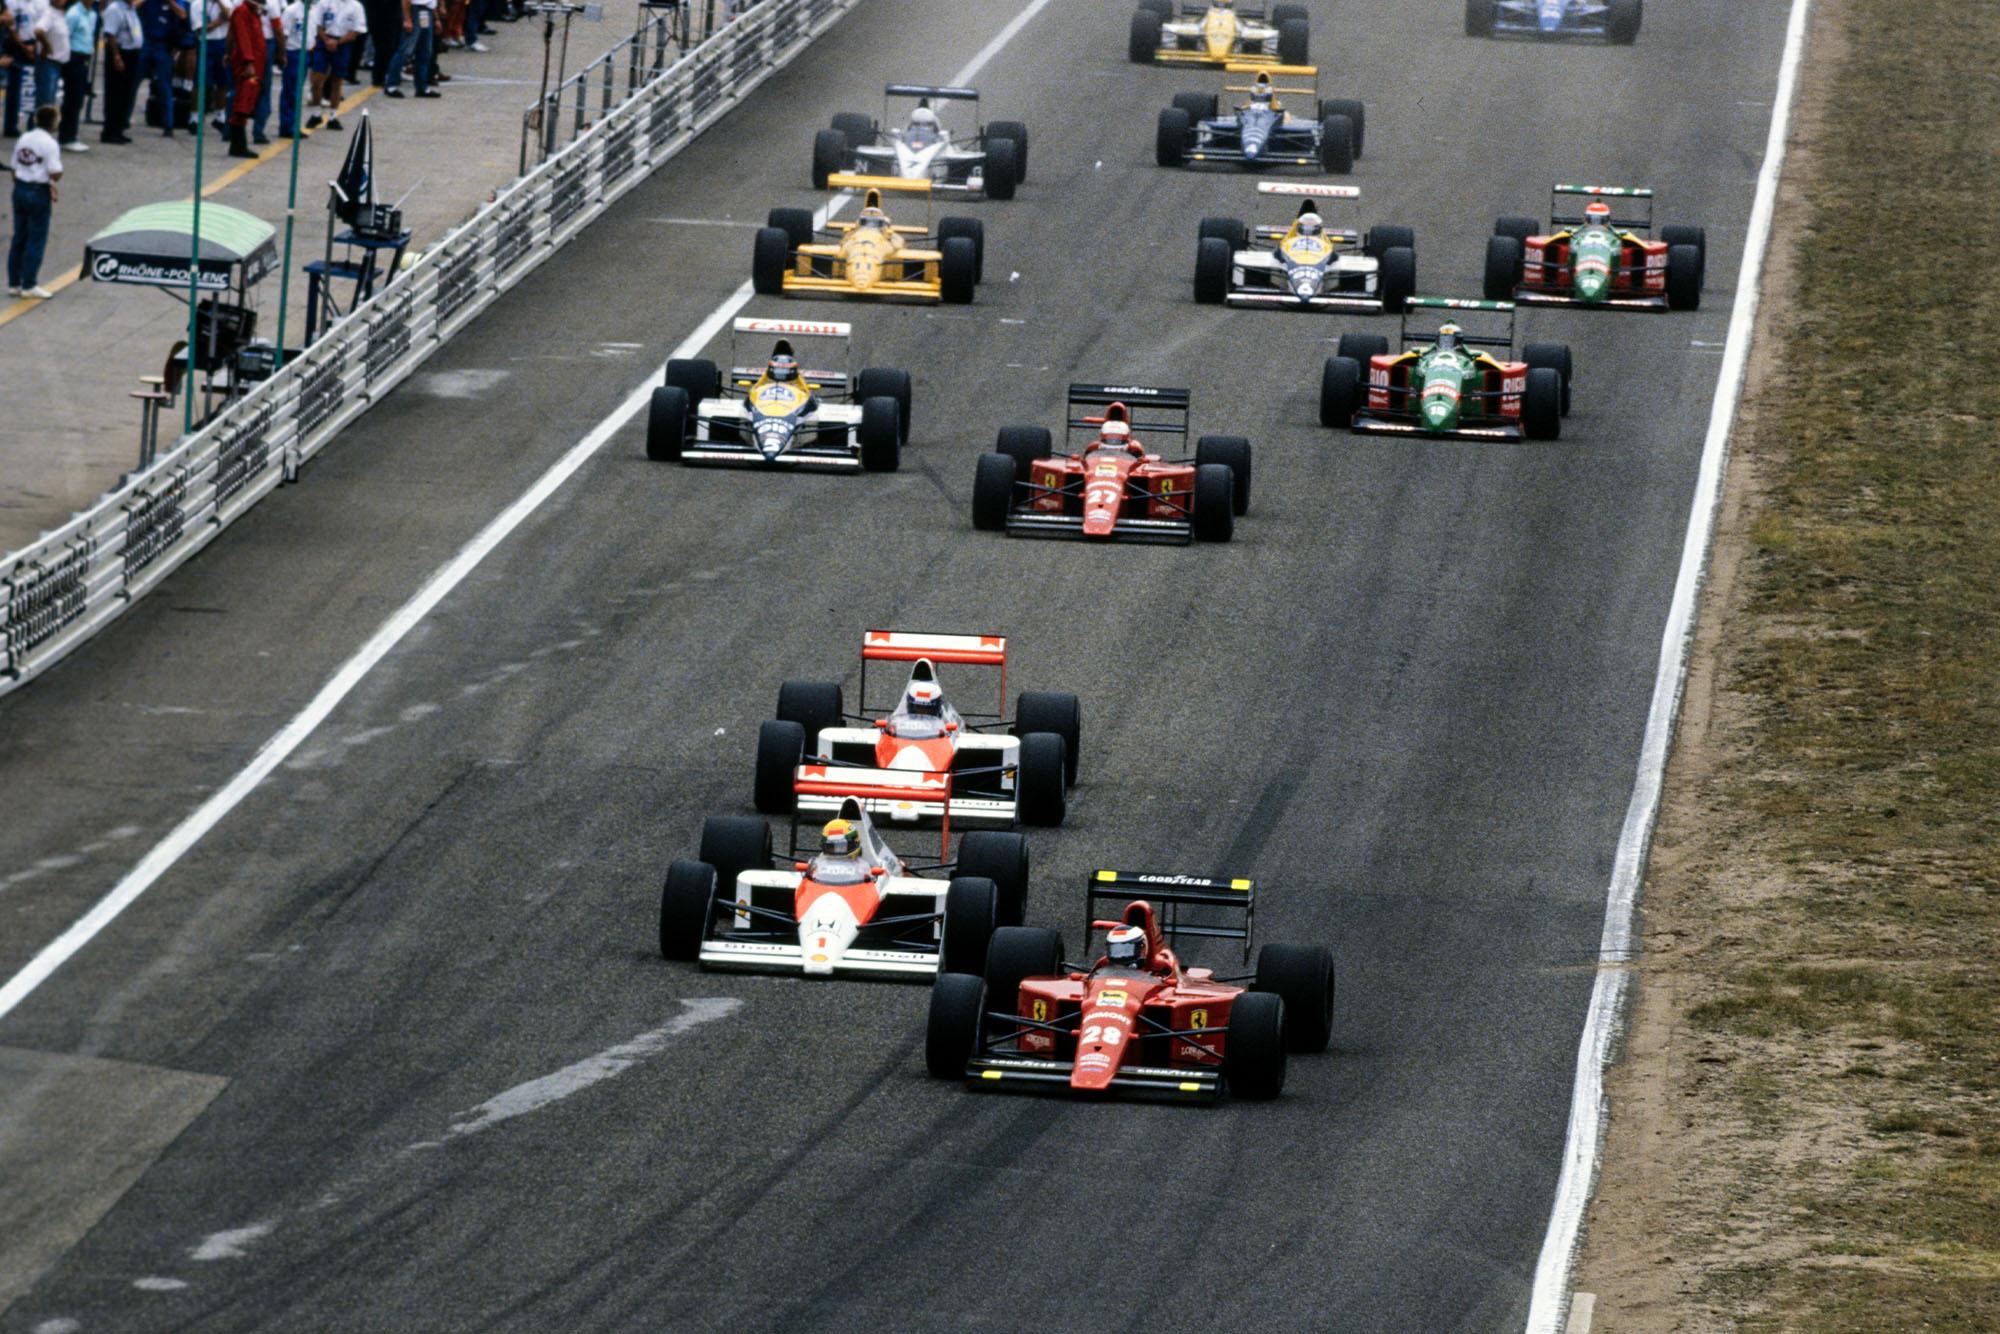 1989 GER GP start